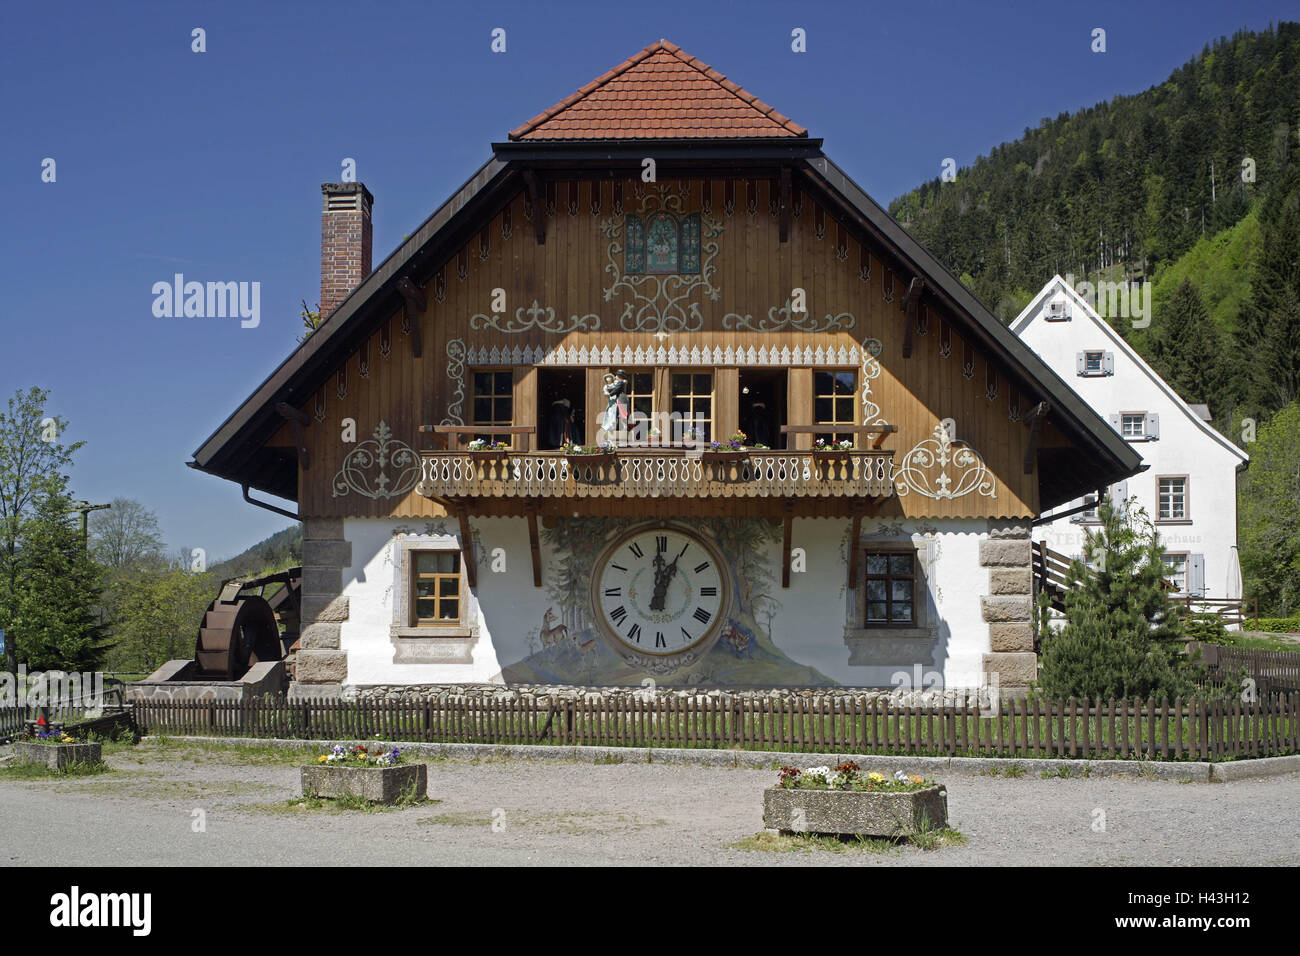 Germany, Baden-Wurttemberg, Black Forest, Höllental